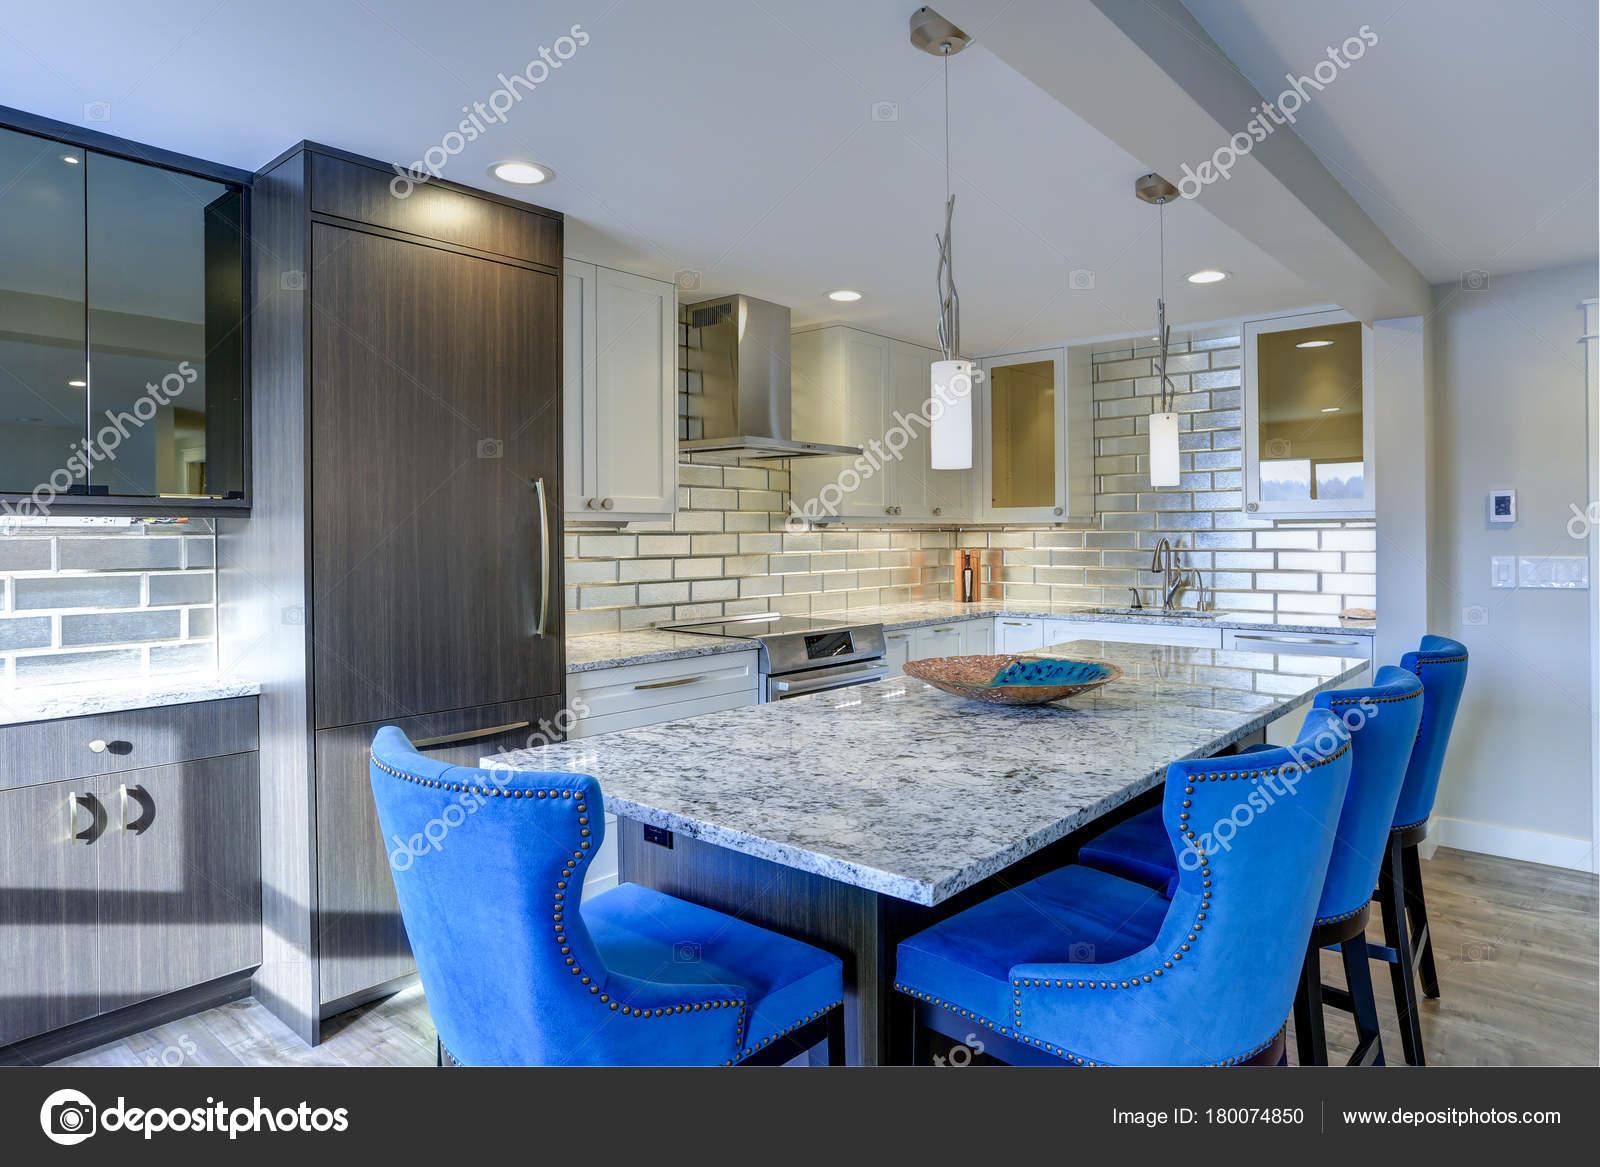 kitchen island tops cheap accessories 现代厨房房在公寓的家 图库照片 c alabn 180074850 配备精良的厨房设有一个大的厨房岛 顶上有灰色的石英石台面 两侧是蓝色簇绒餐椅和银色钉饰